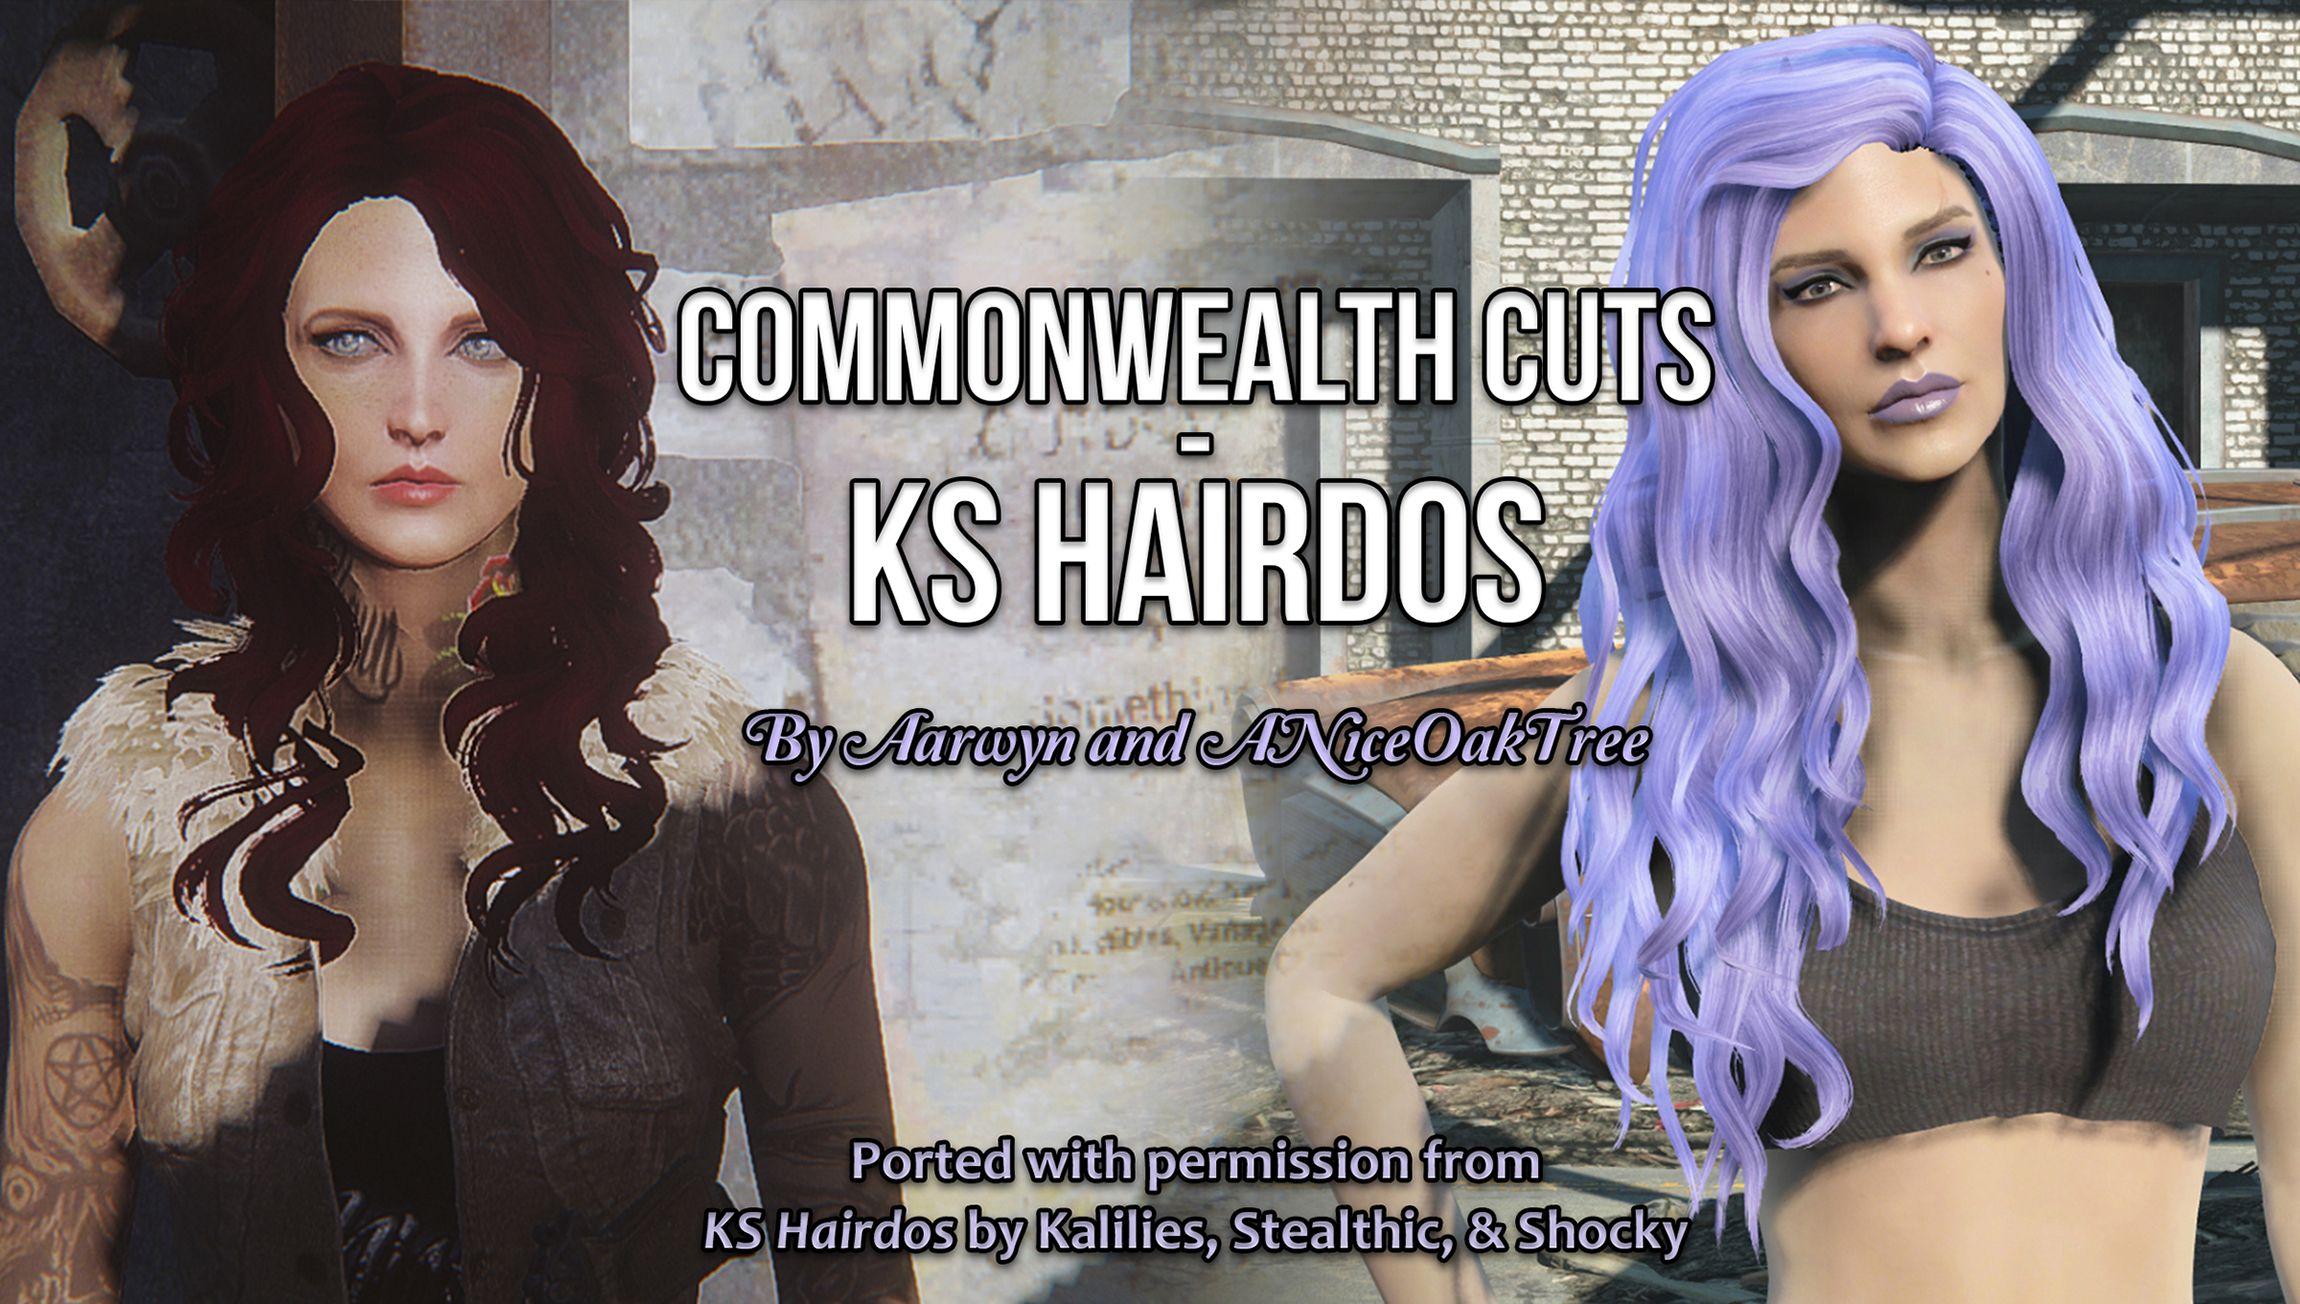 Commonwealth Cuts - KS Hairdos | Fallout 4 | Fallout 4 mods, Fallout